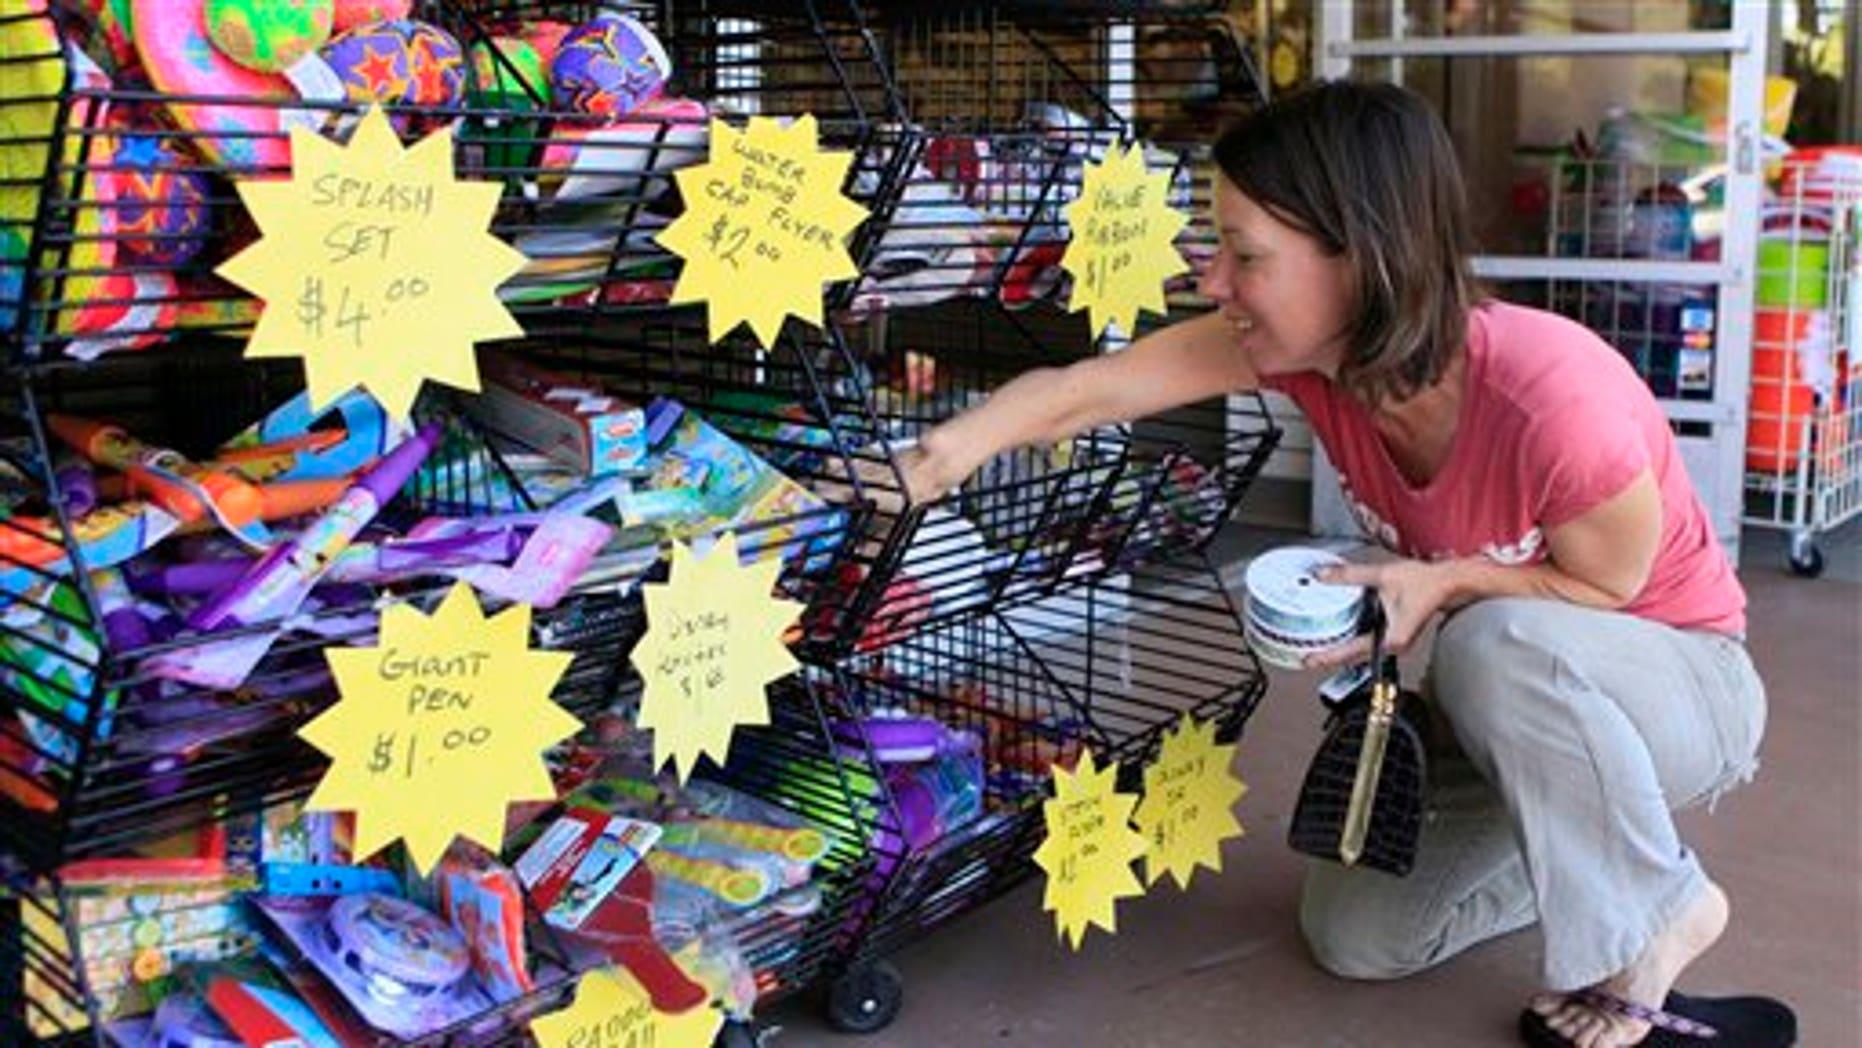 May 11: Shopper at the Michaels store in Westridge Village shopping mall in Santa Clarita, California.